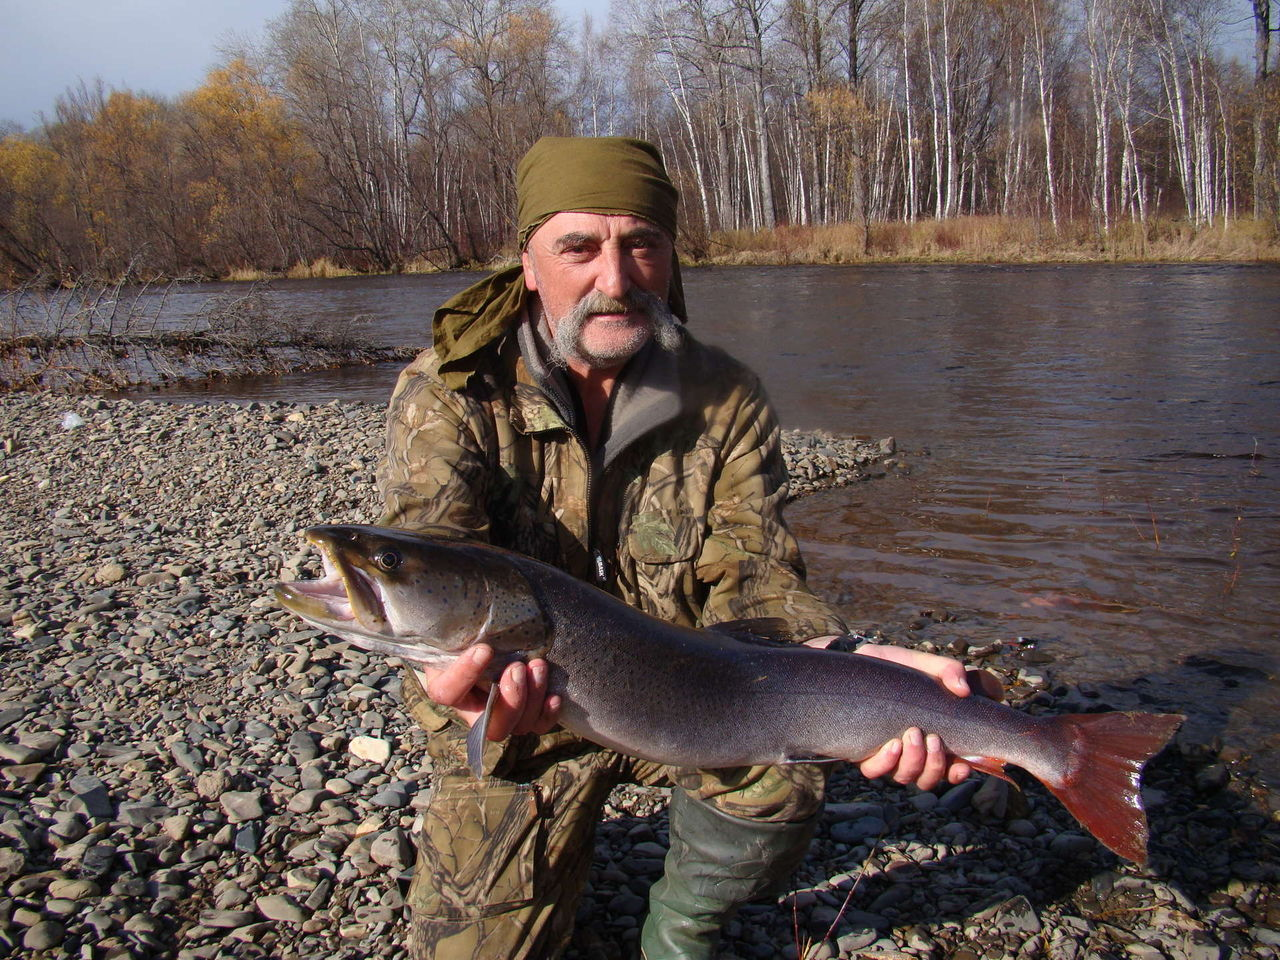 Рыбалка на щуку и тайменя